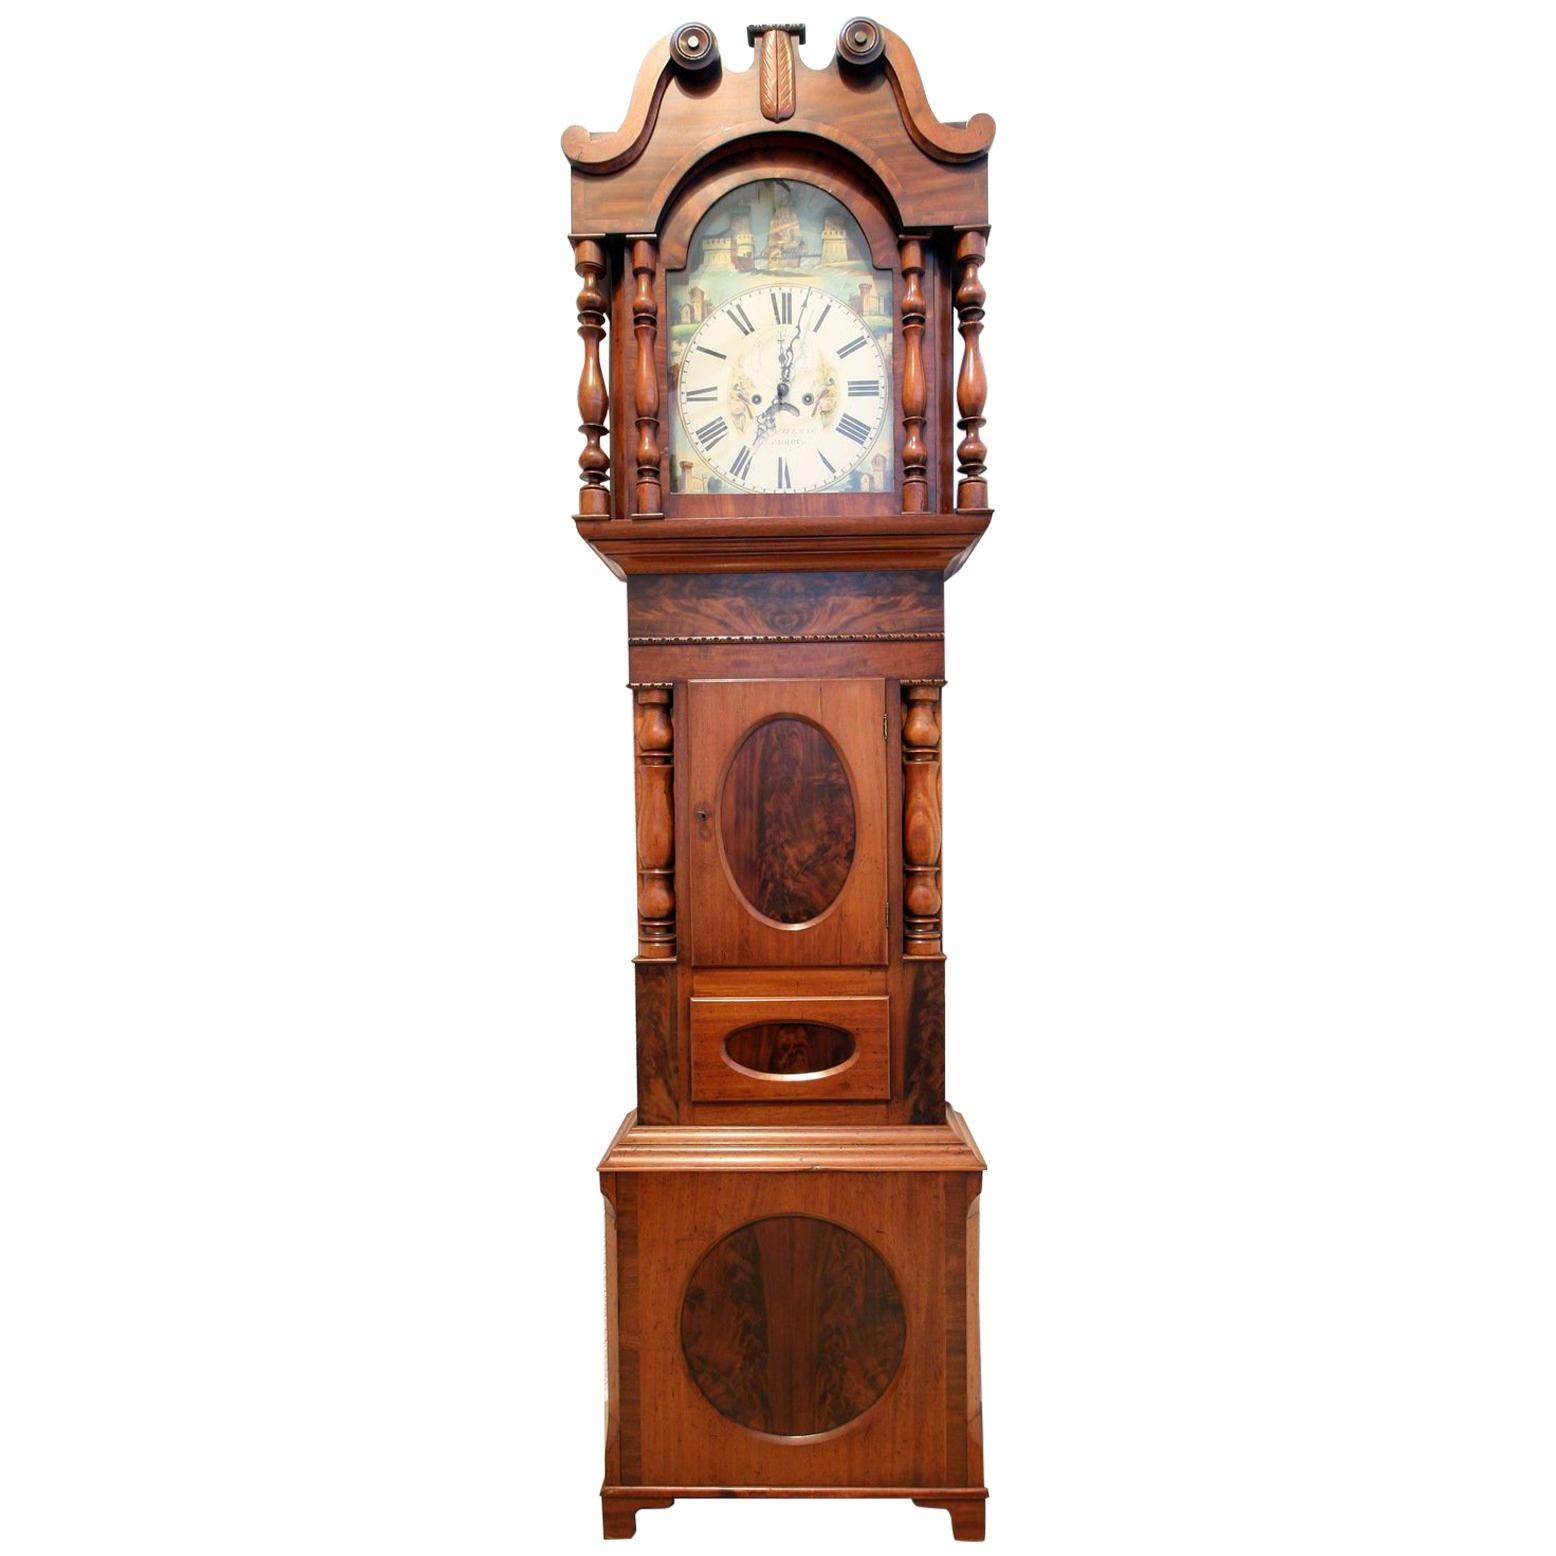 Tall Case Clock in Mahogany, Bristol, England, circa 1830, Victorian